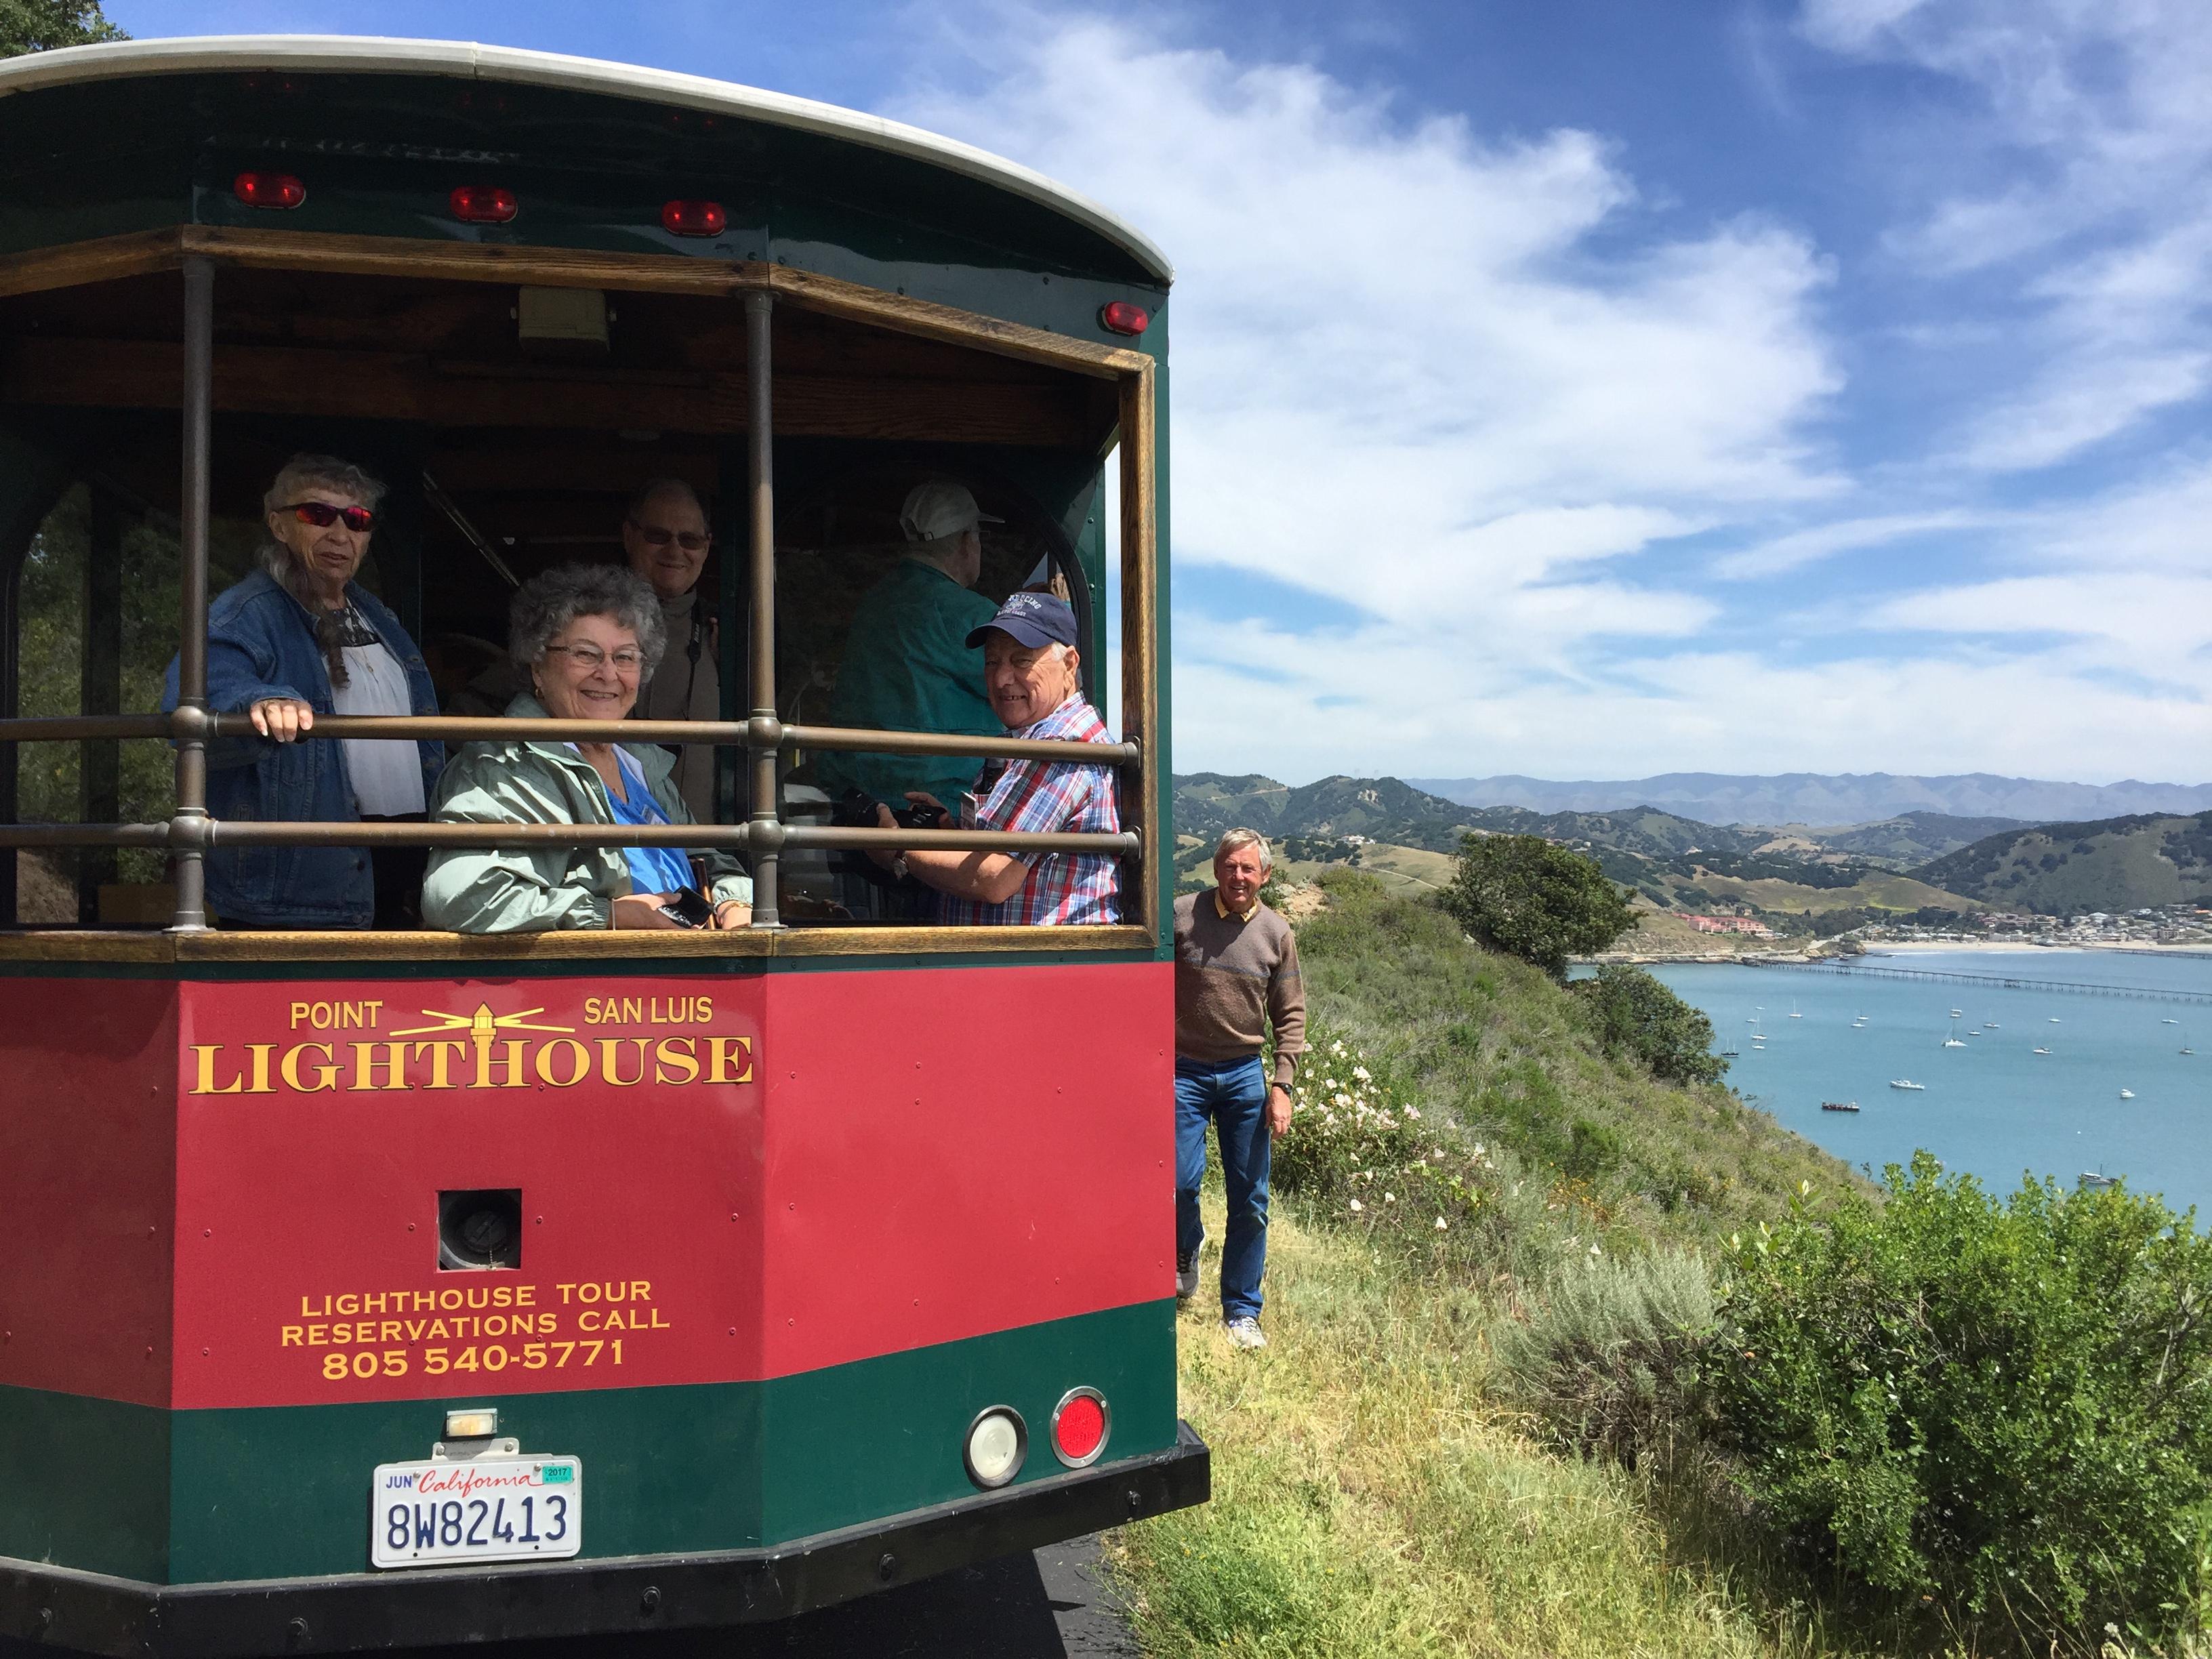 Tram tour on the coast